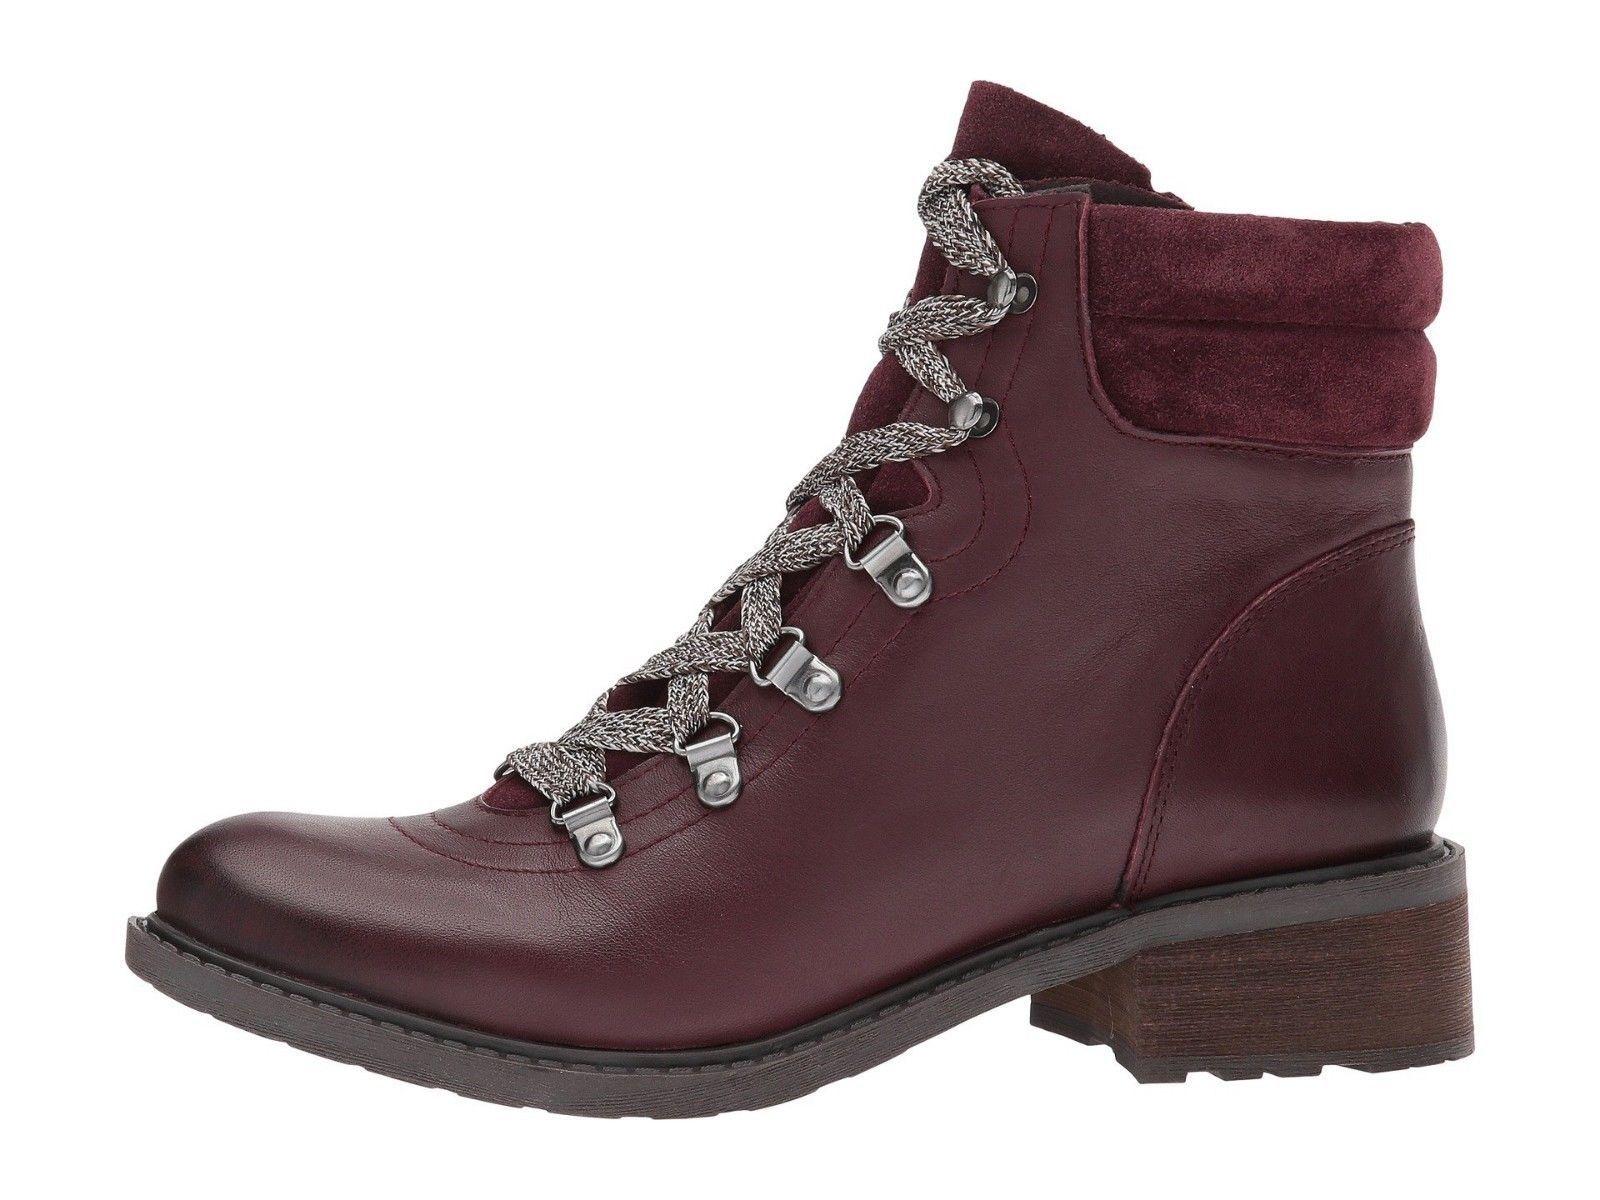 3c52e0995 Sam Edelman Darrah Lace Up Boot Wine Leather Suede Size US 6.5 M   EU